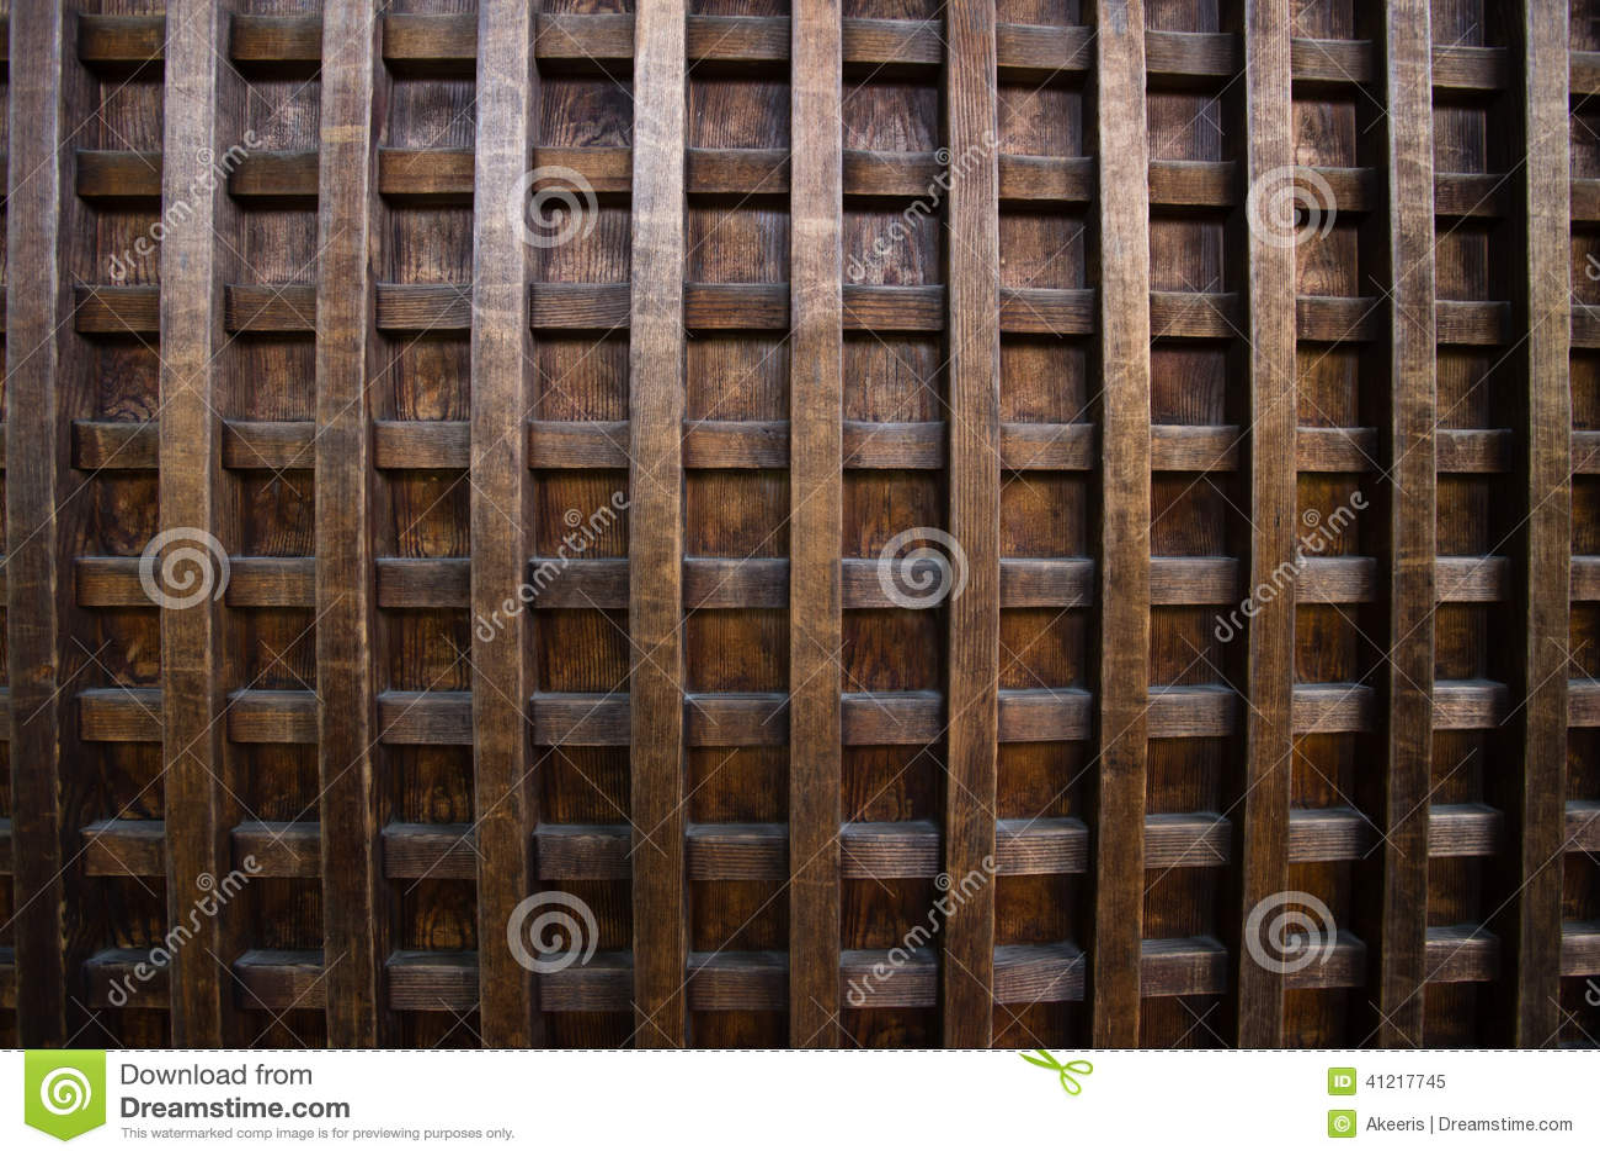 Wood Texture Stock Photo Image 41217745